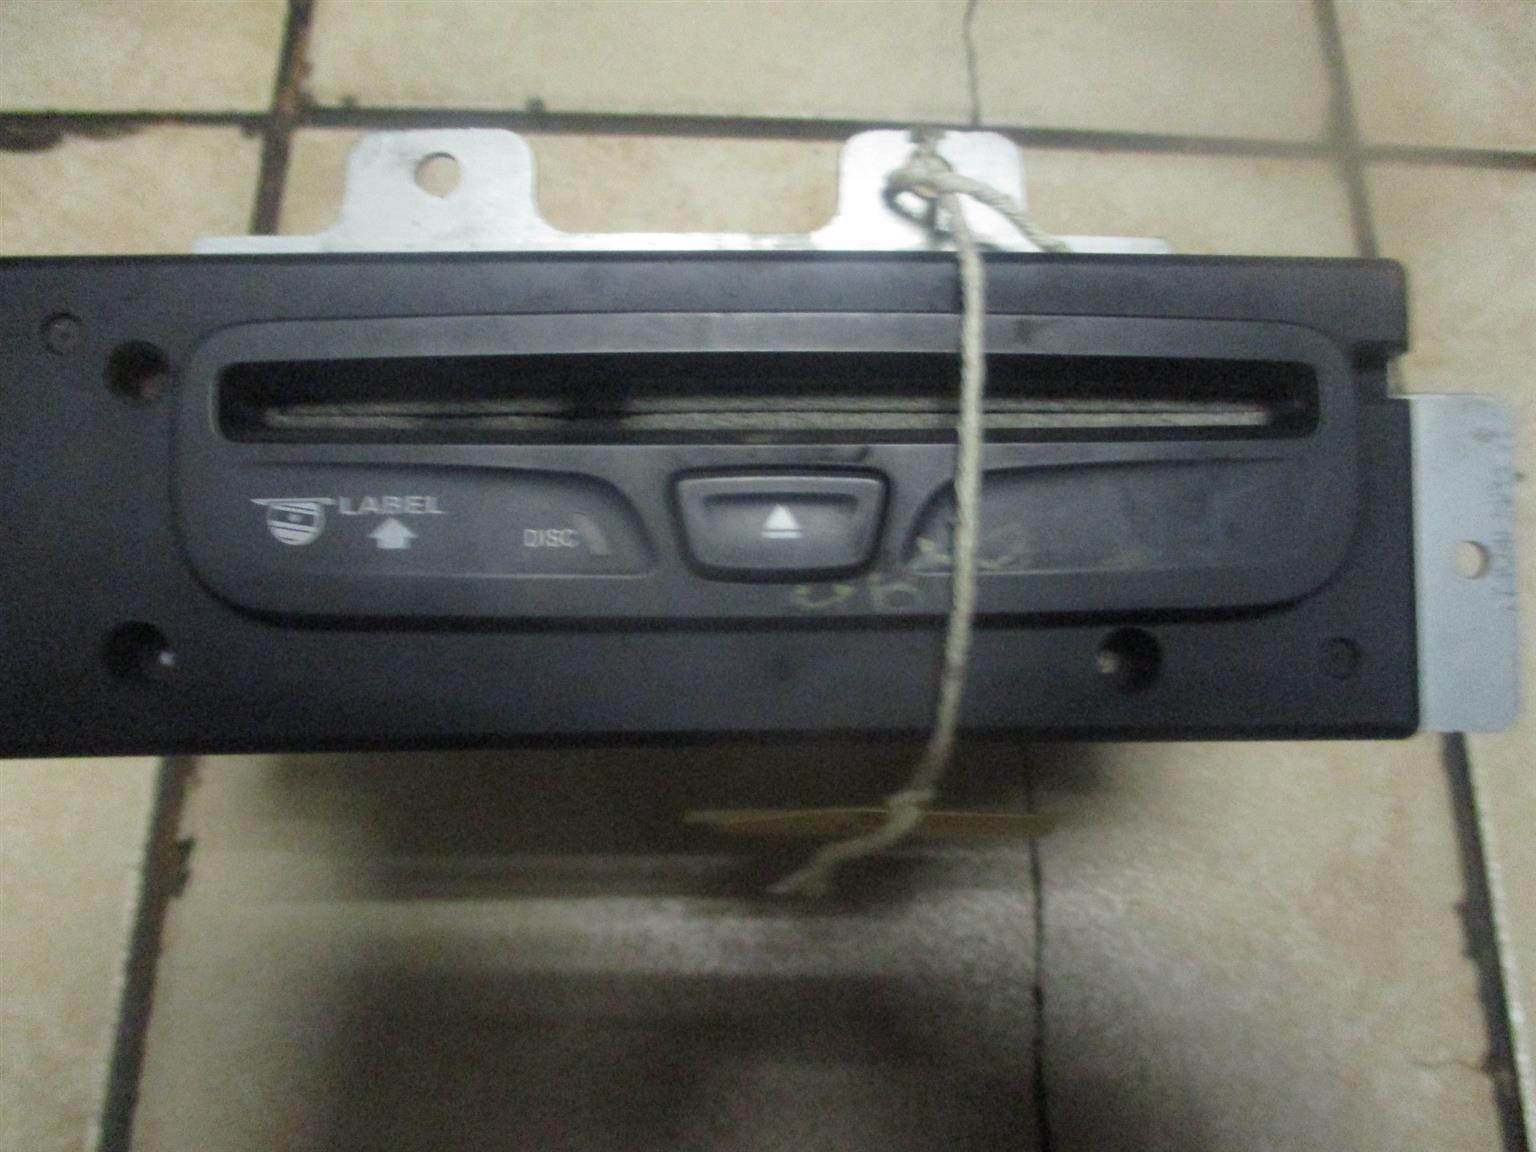 CHRYSLER VOYAGER 2.4 SE RADIO & ENTERTAINMENT SYSTEM FOR SALE